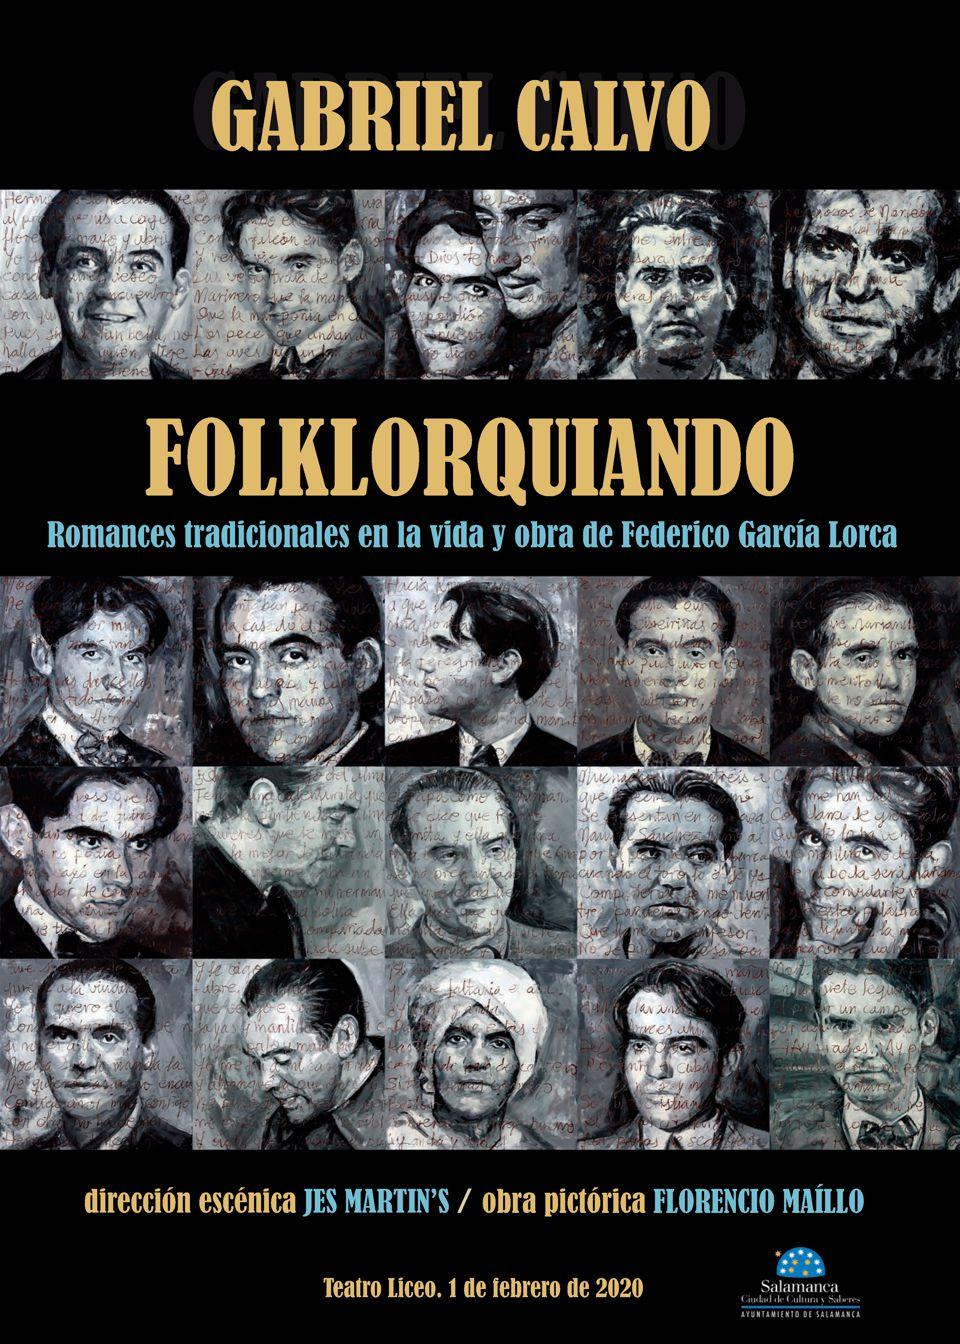 Folklorquiando Salamanca 1 de Febrero de 2020